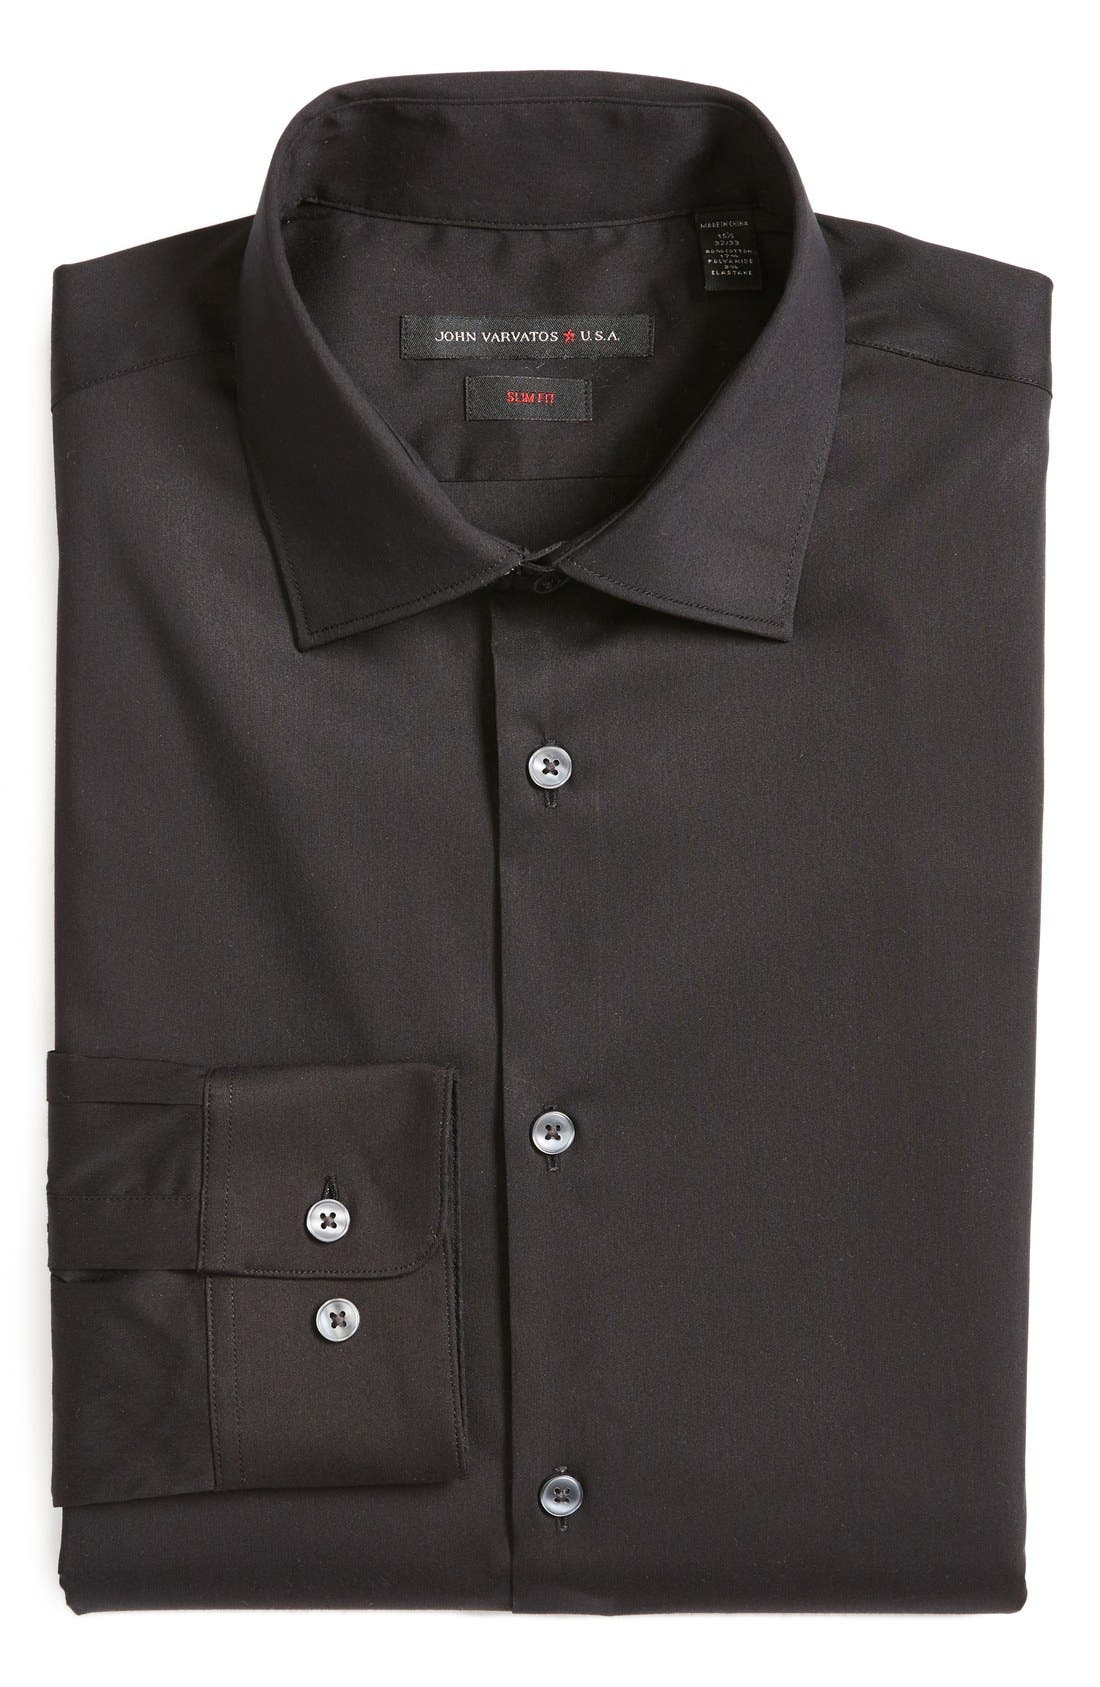 Alternate Image 1 Selected - John Varvatos Star USA Slim Fit Solid Stretch Cotton Dress Shirt